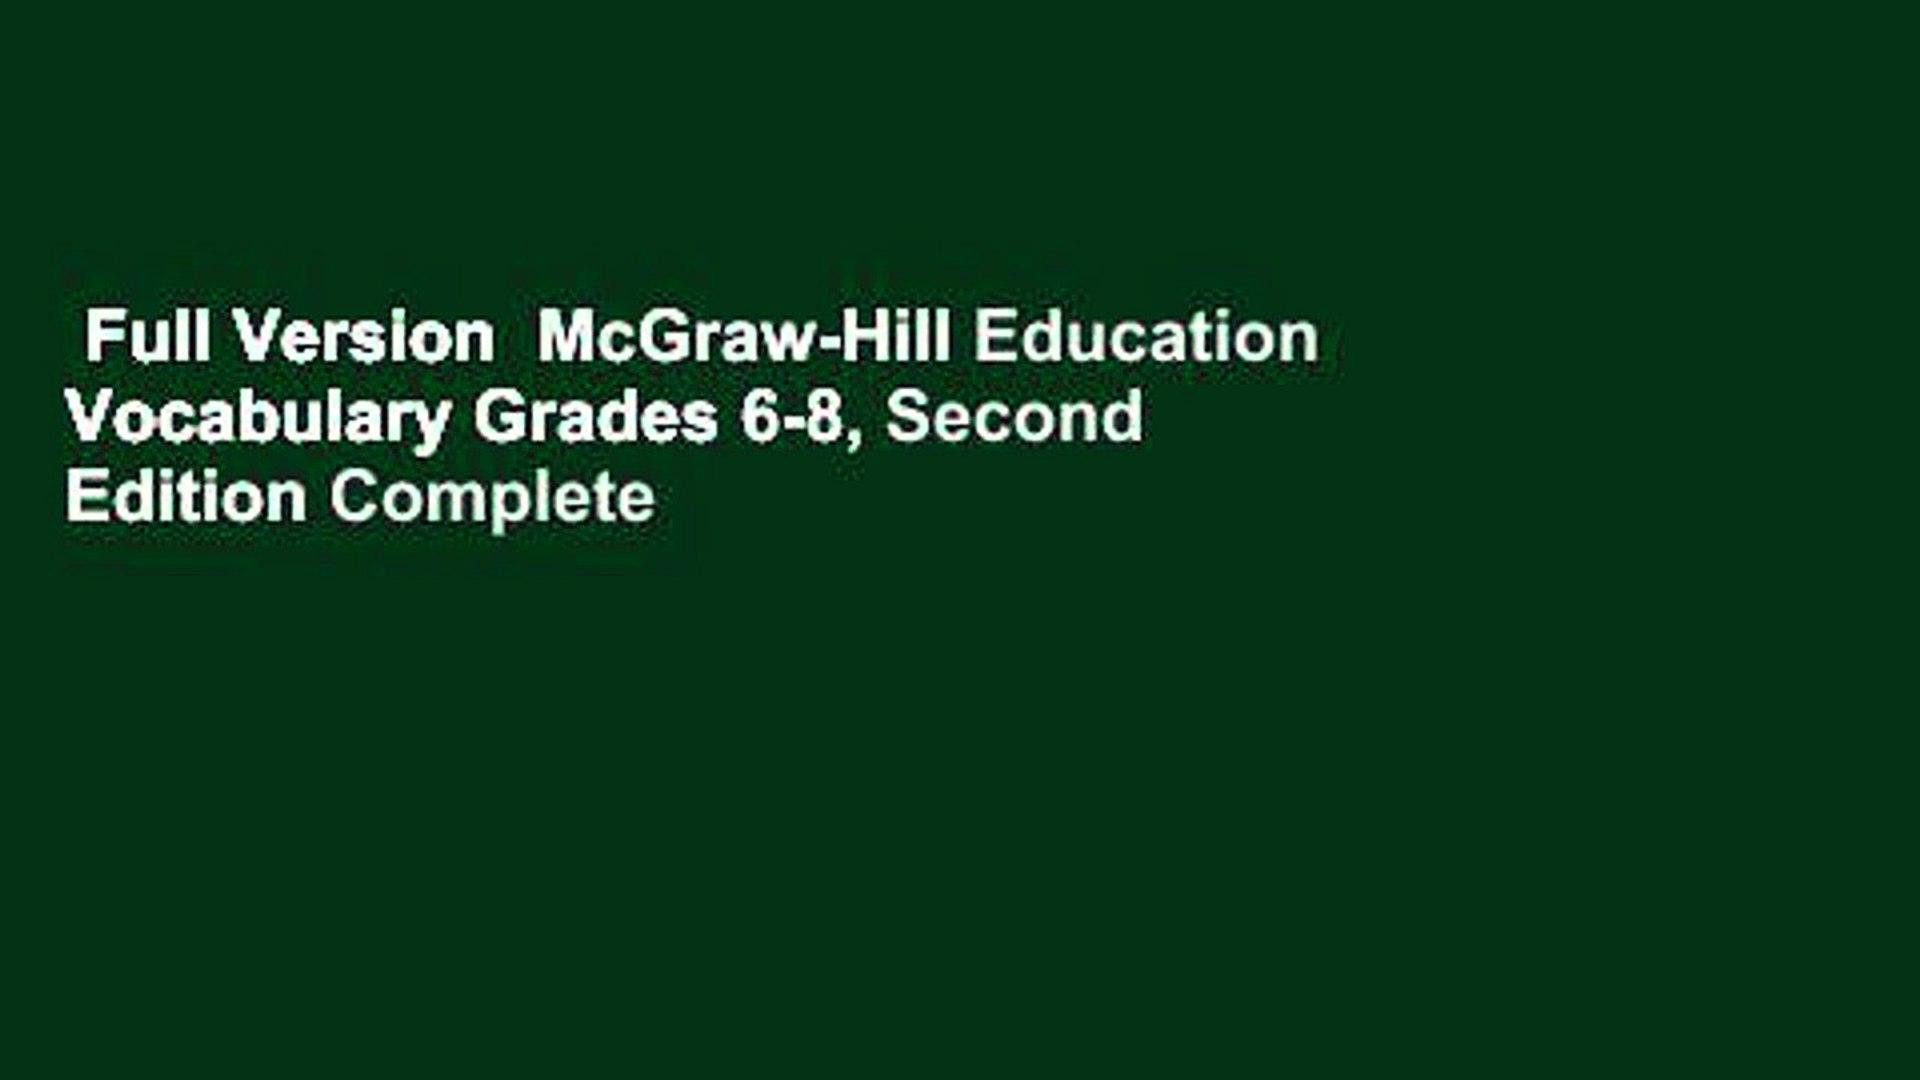 hight resolution of Full Version McGraw-Hill Education Vocabulary Grades 6-8